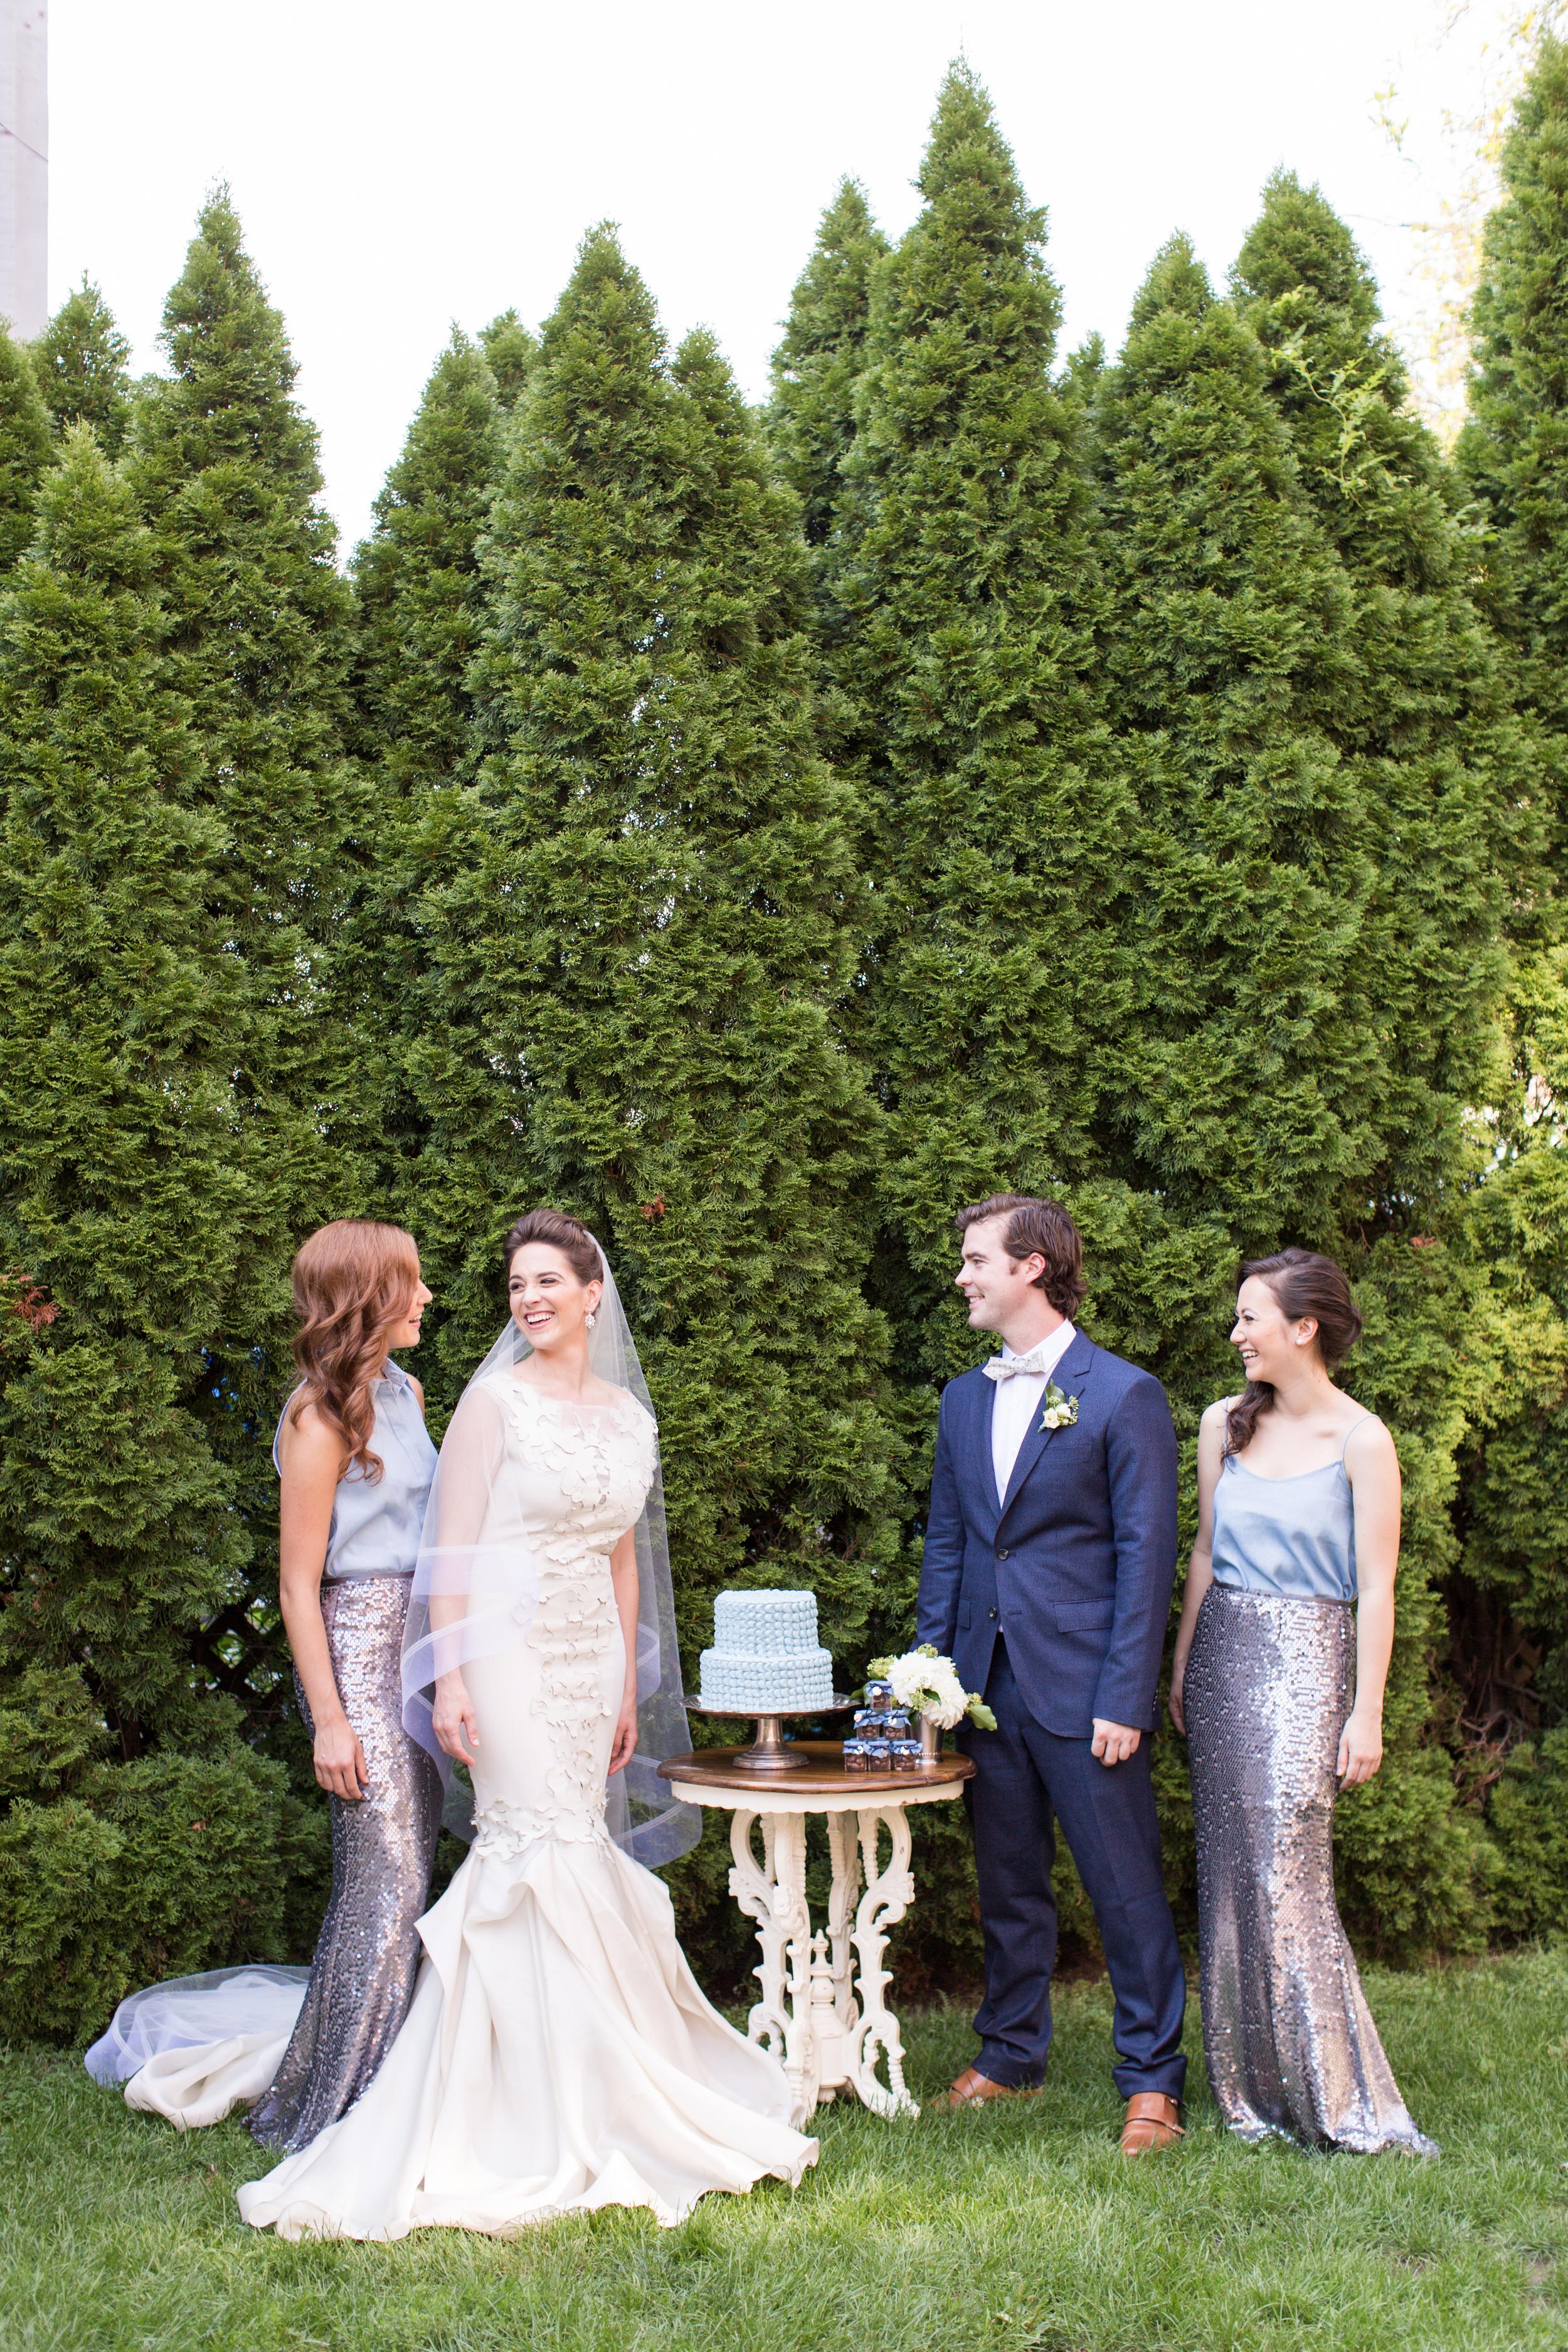 hannah_shih_hanaluluco_cj_isaac_charlie_juliet_ombre_chambray_prospect_park_brooklyn_wedding_26.jpg